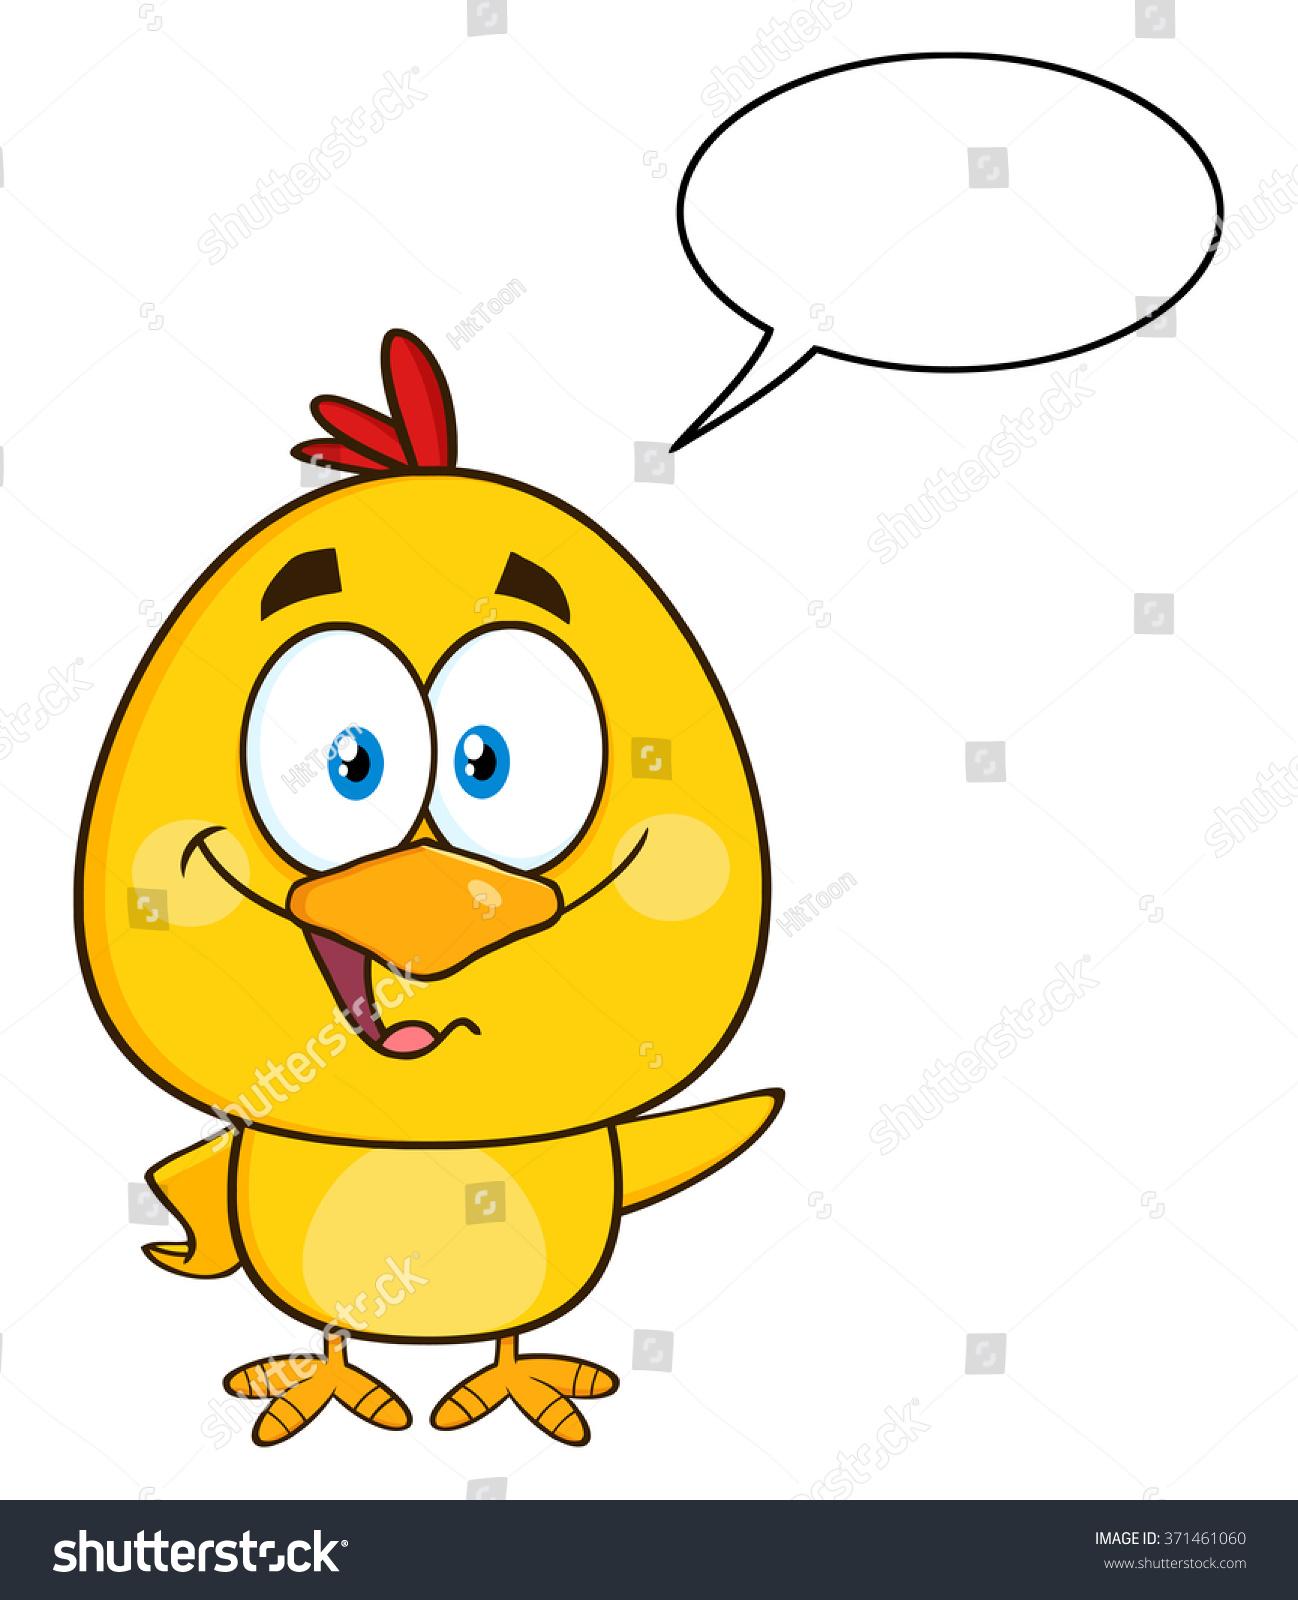 cute yellow chick cartoon character waving stock vector